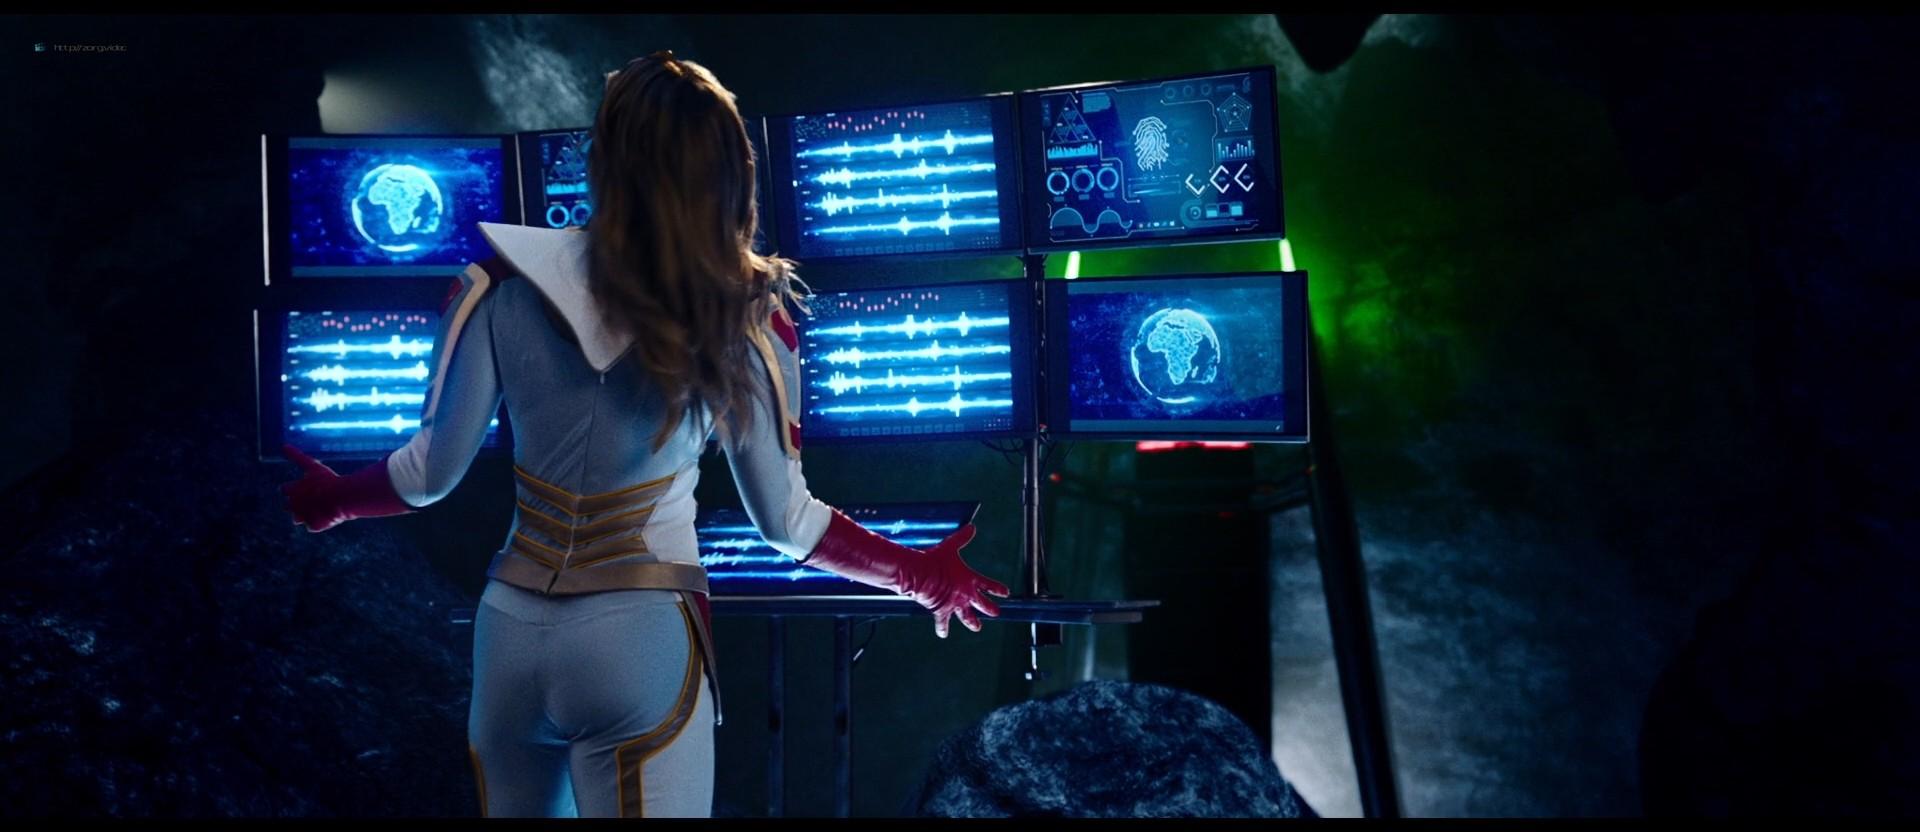 Melissa Benoist hot Shannon Elizabeth sexy - Jay and Silent Bob Reboot (2019) HD 1080p BluRay (4)